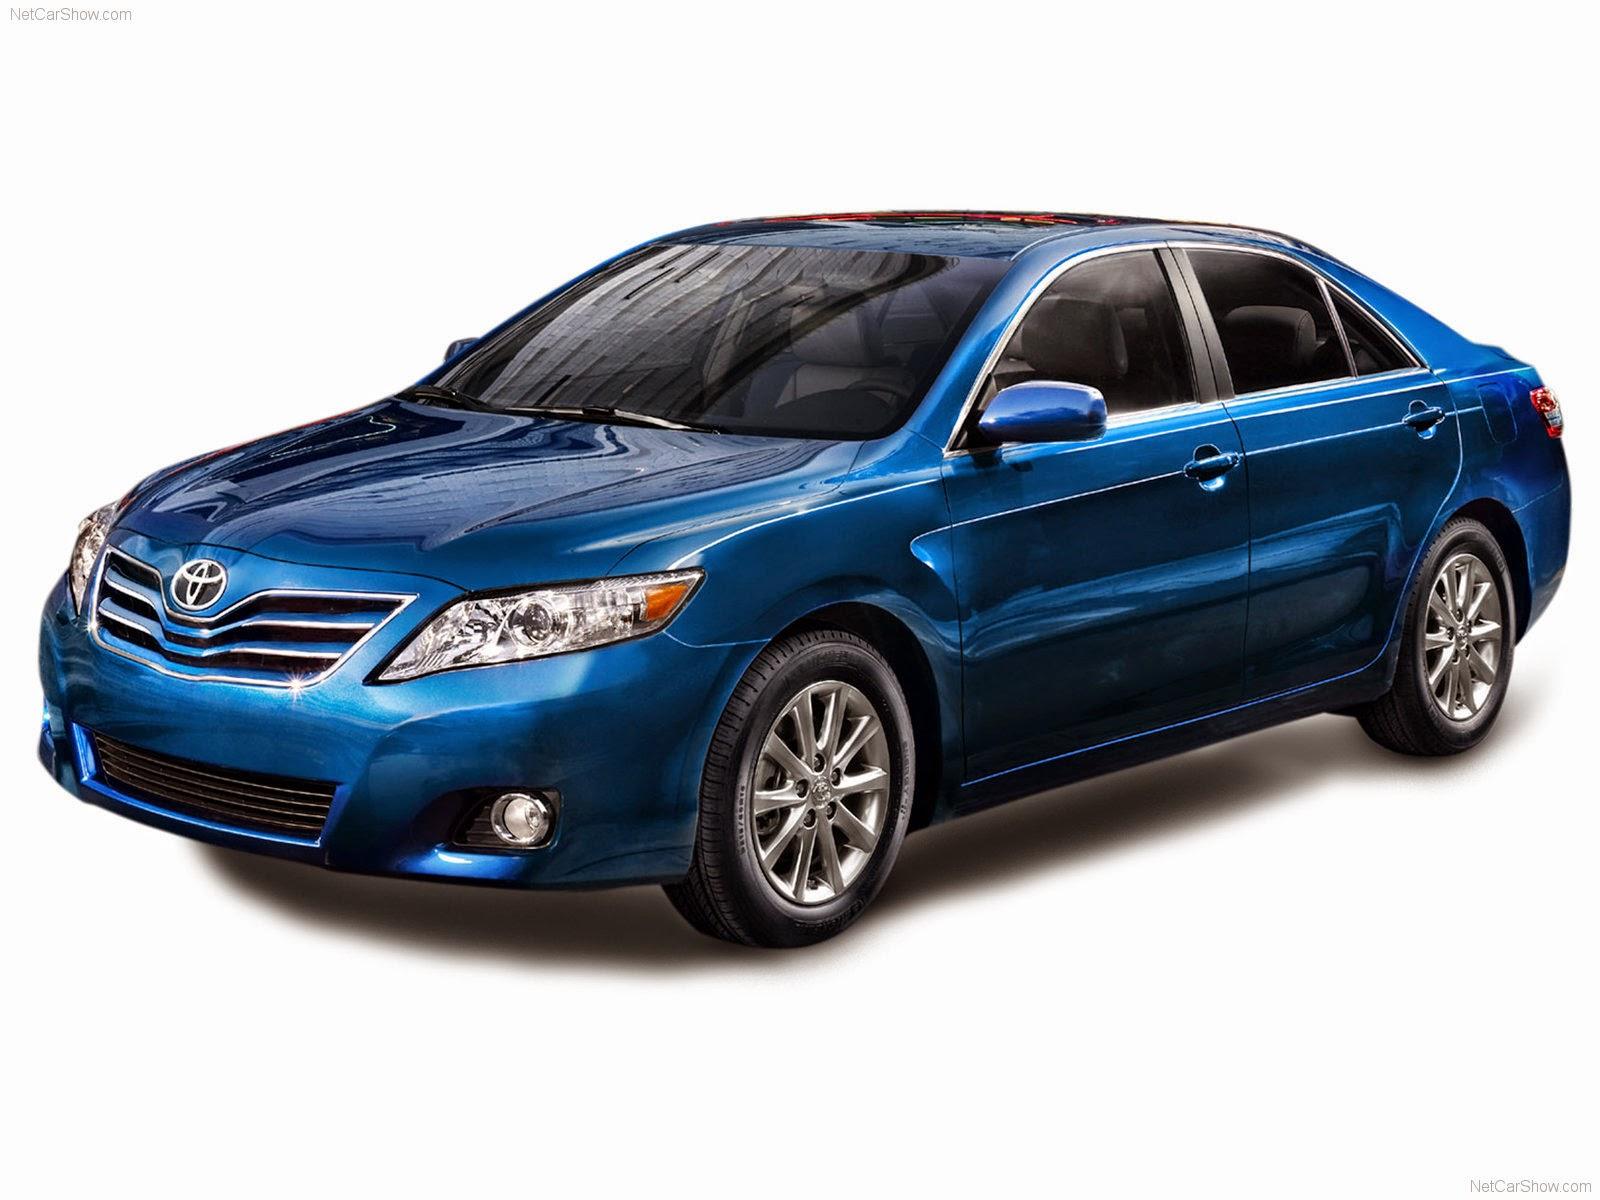 2011 toyota camry new car updates 2019 2020 rh sdbpi org Toyota Camry Electrical Wiring Diagram Toyota Camry vs Honda Accord